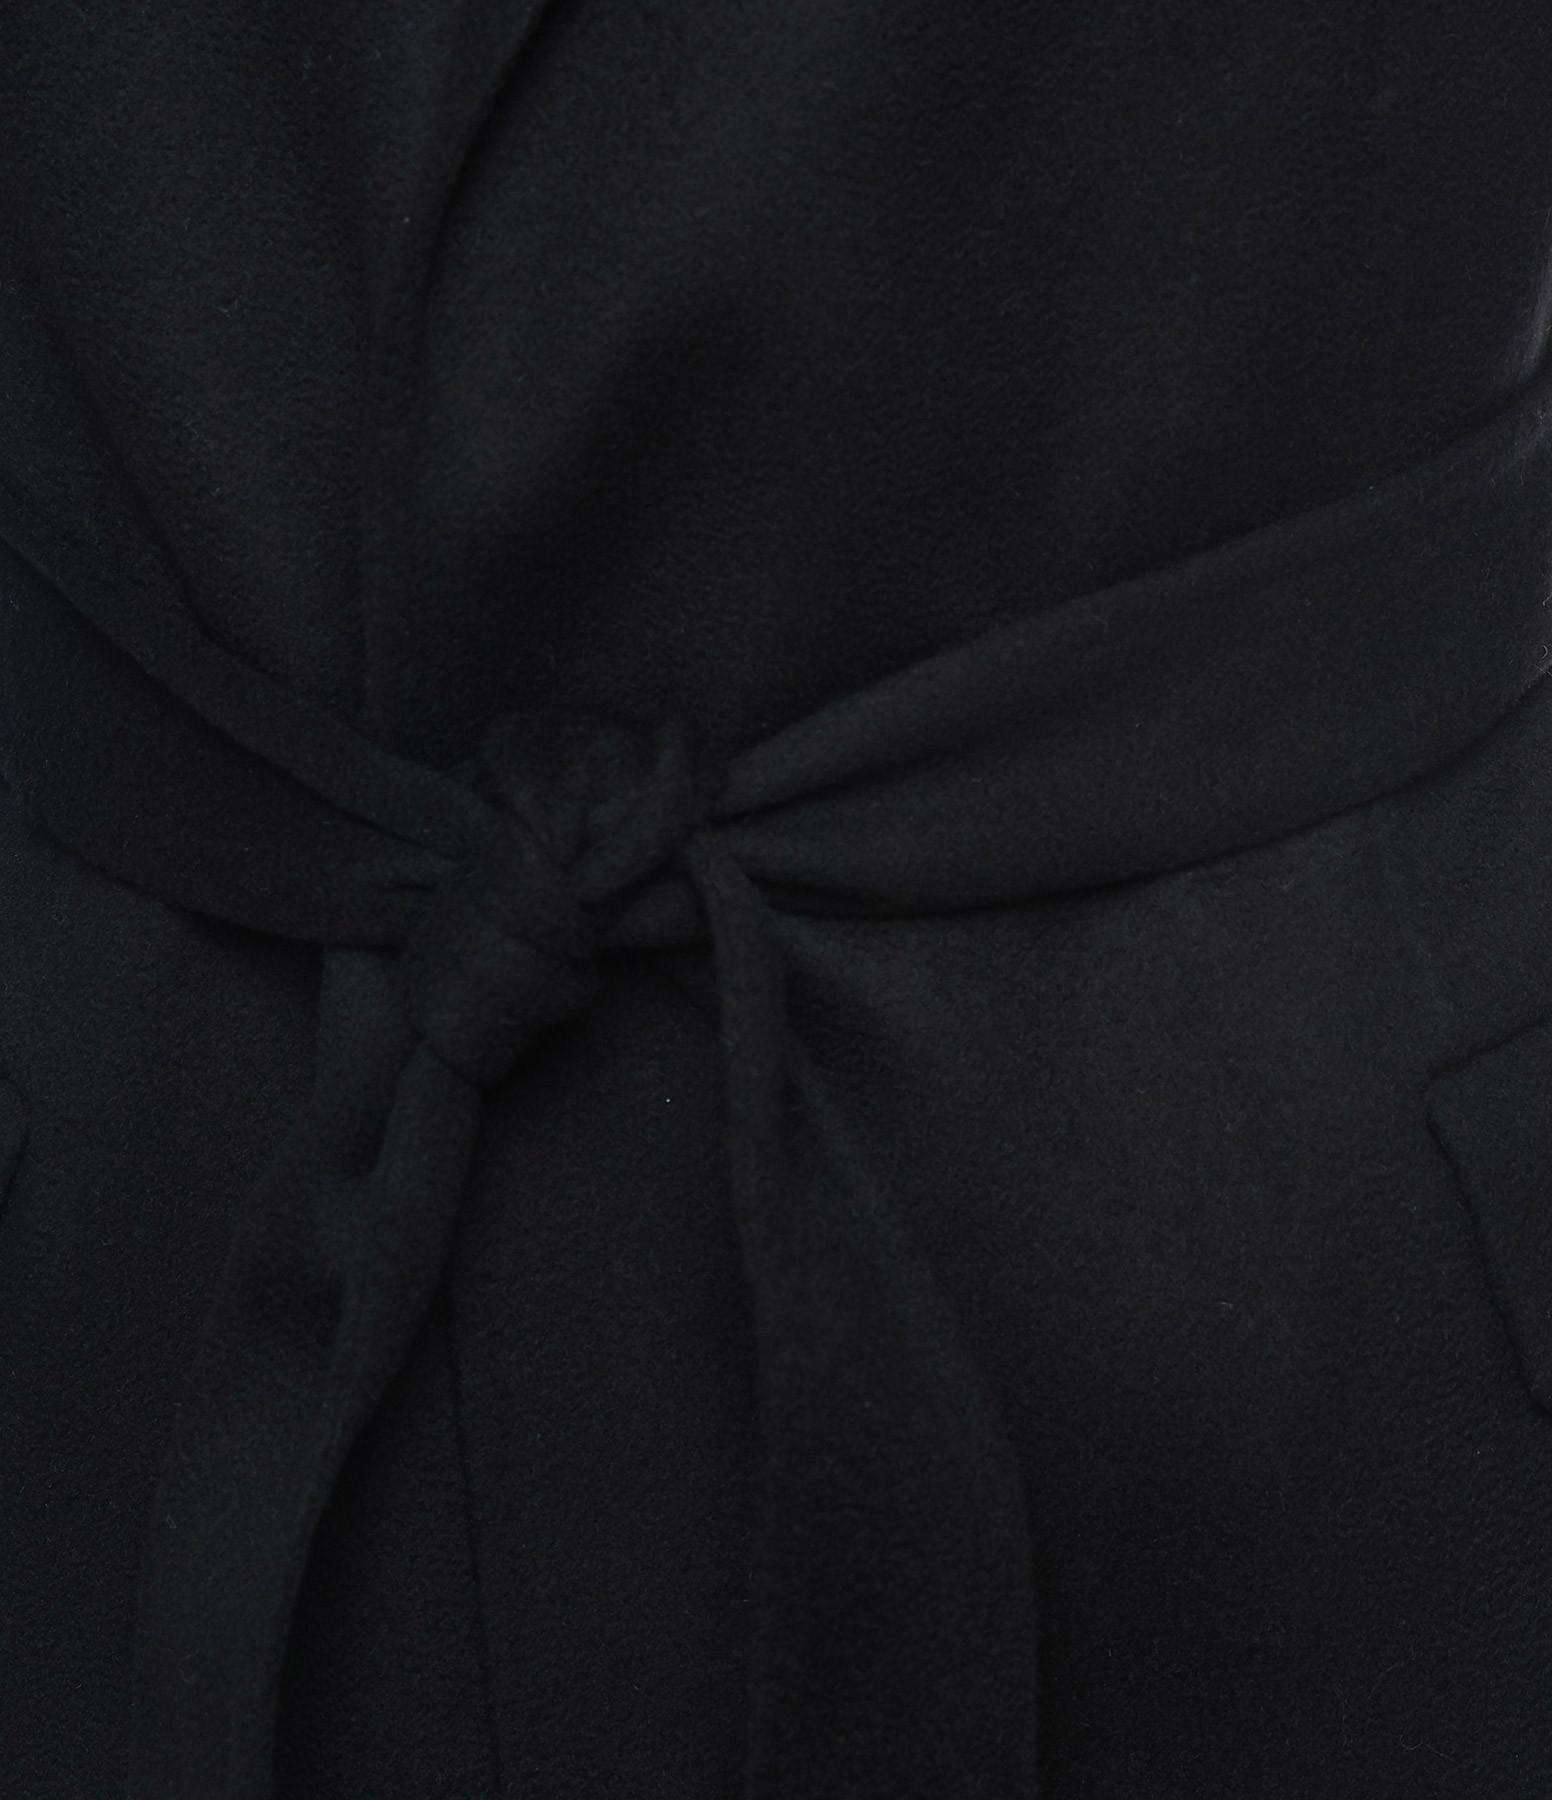 THEORY - Manteau Long Noir